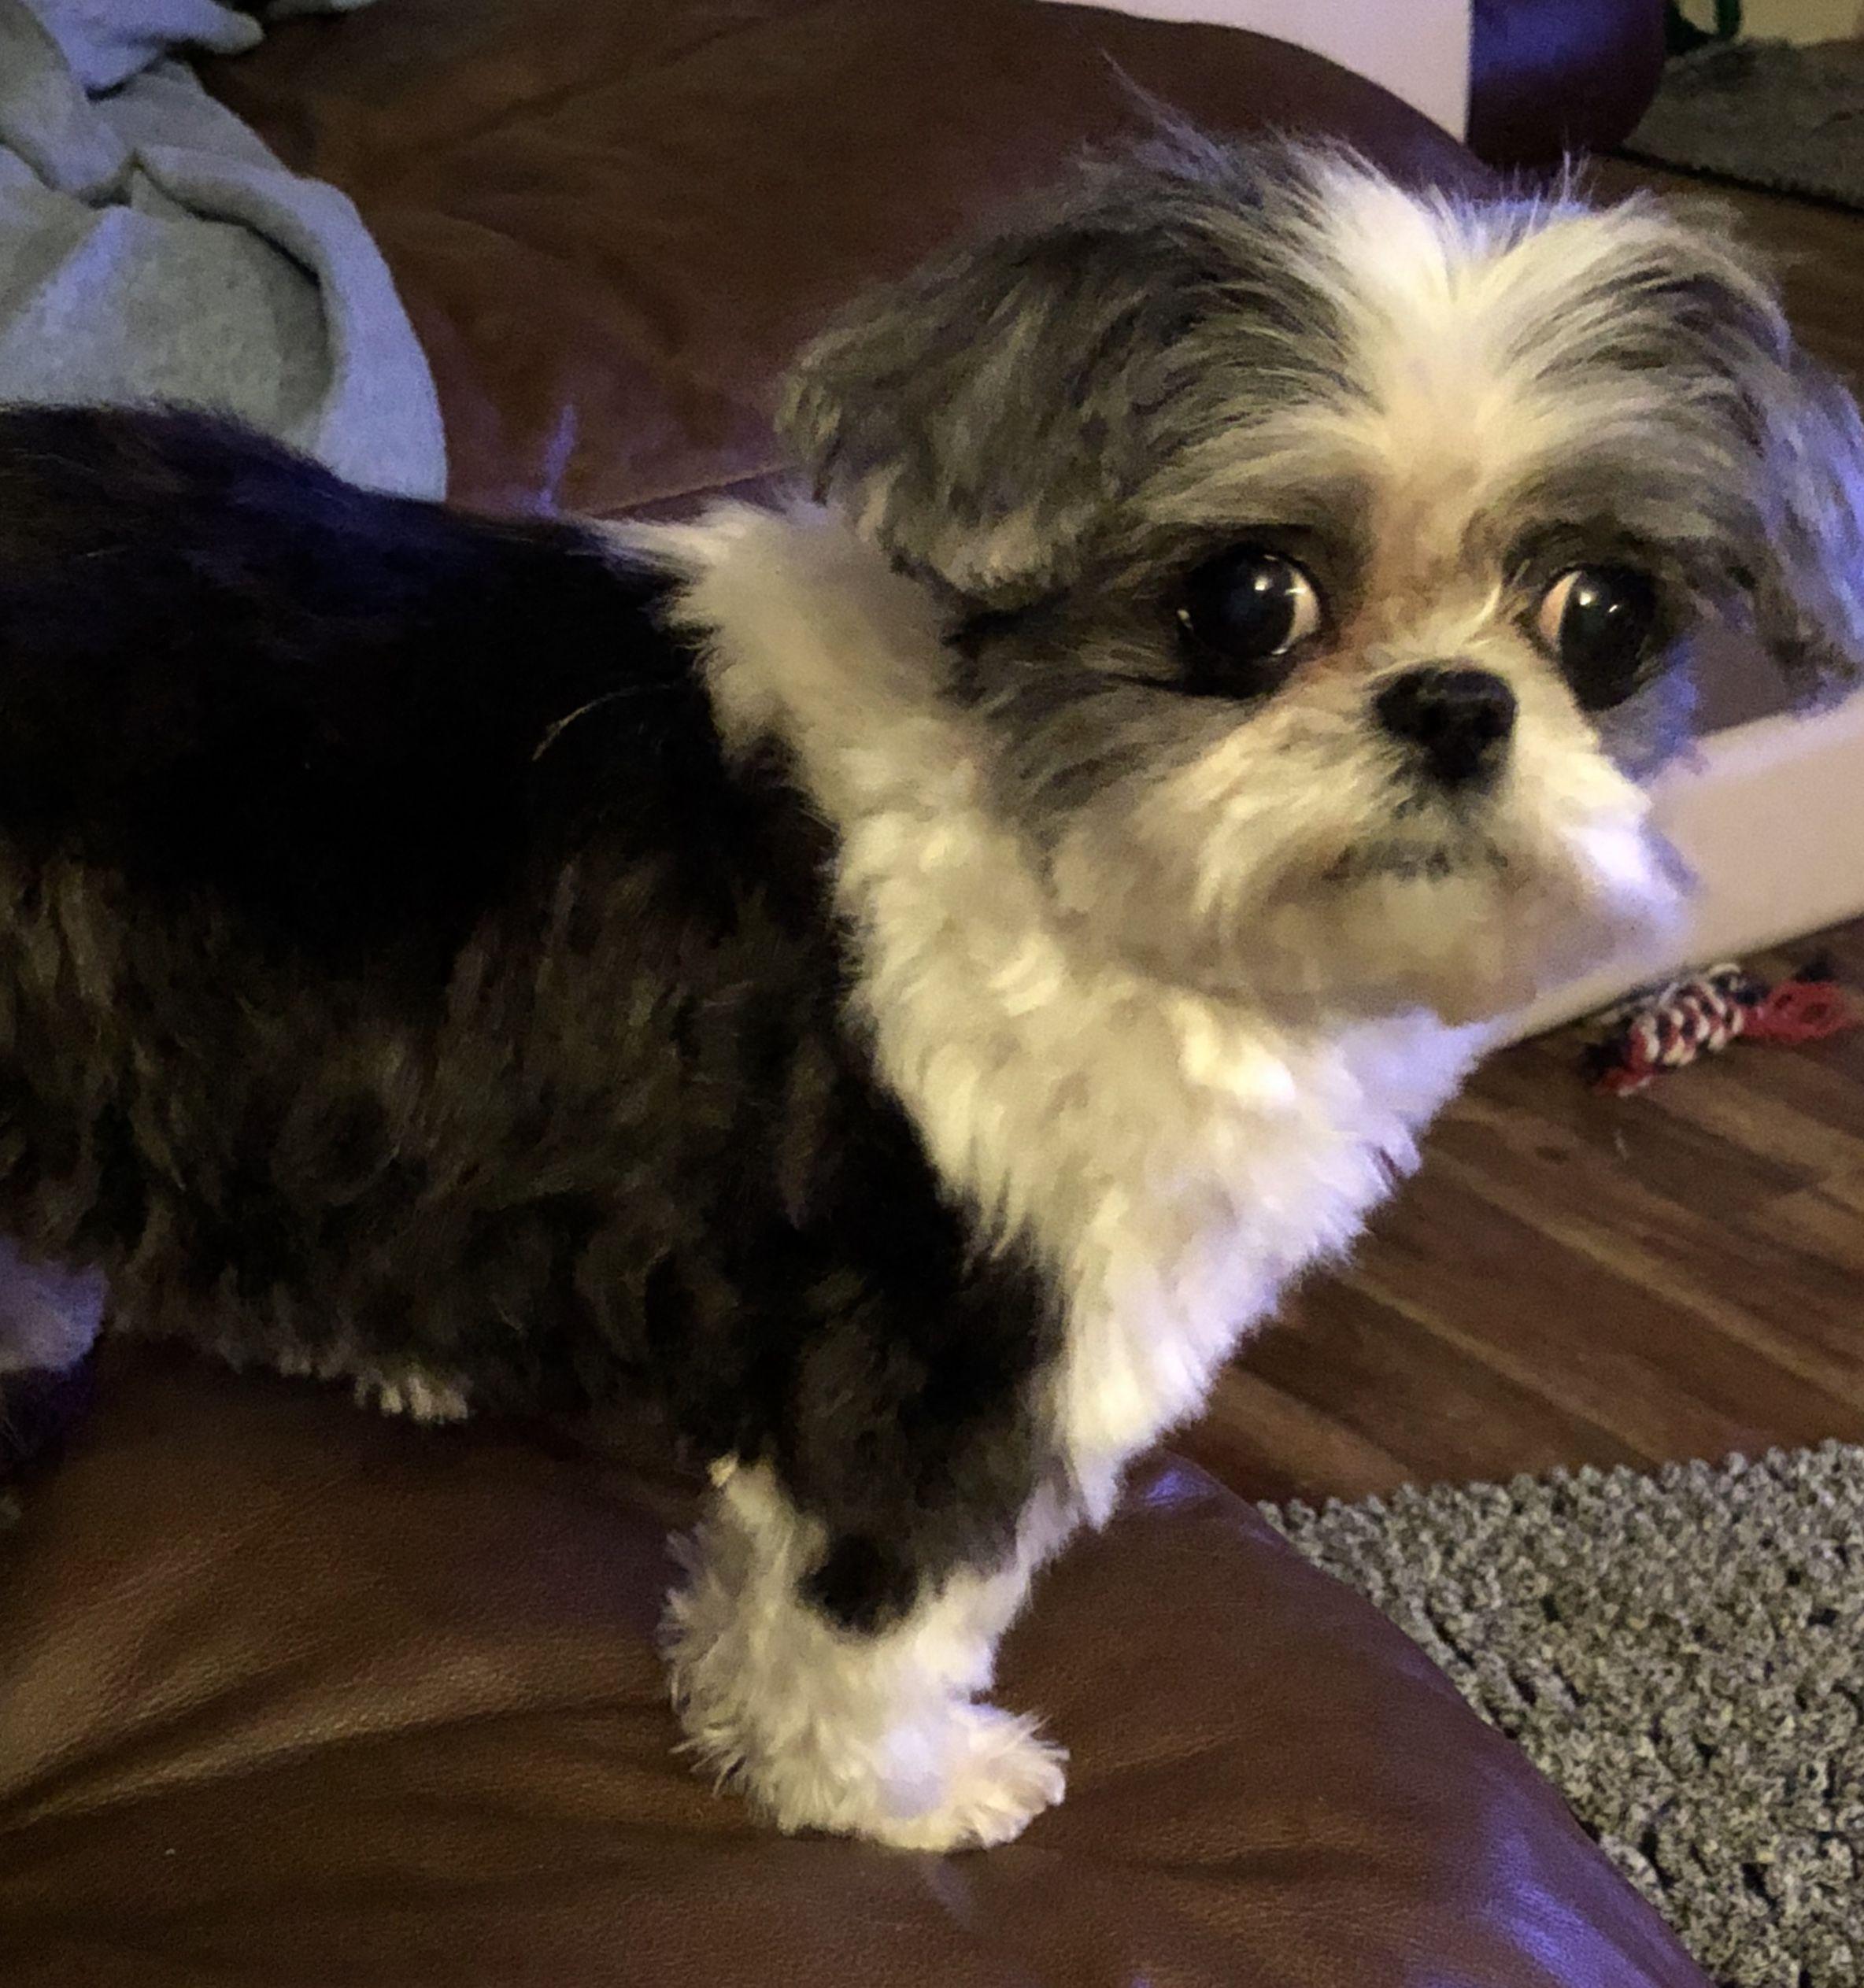 Shih Tzu dog for Adoption in Pataskala, OH. ADN772957 on